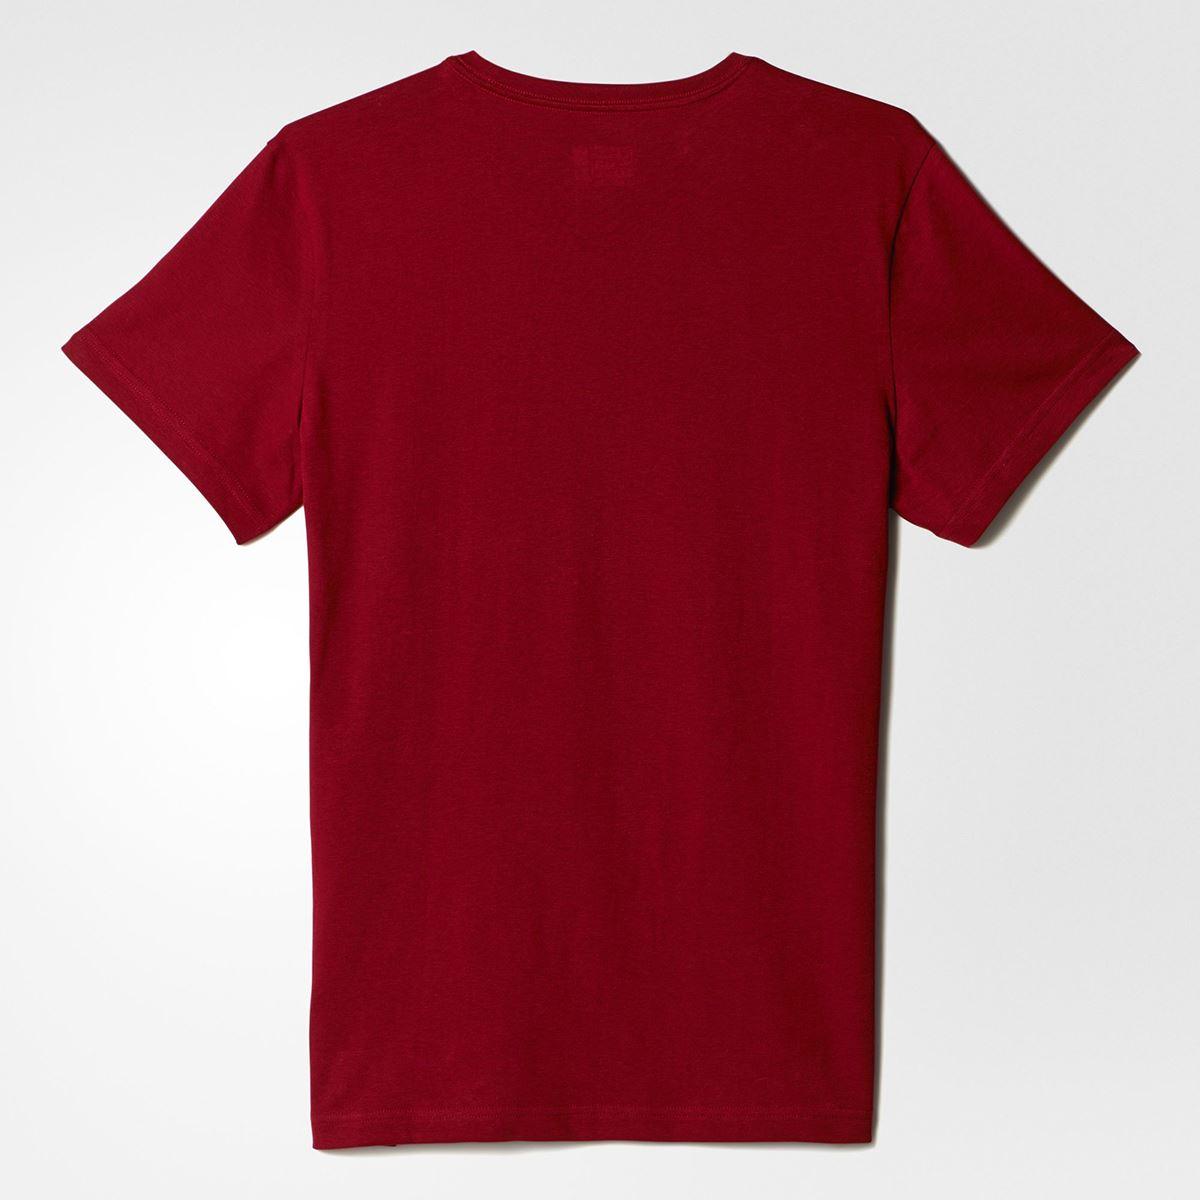 ... adidas Russia Climalite T-Shirt Mens Red Football Soccer Top Tee Shirt  ...